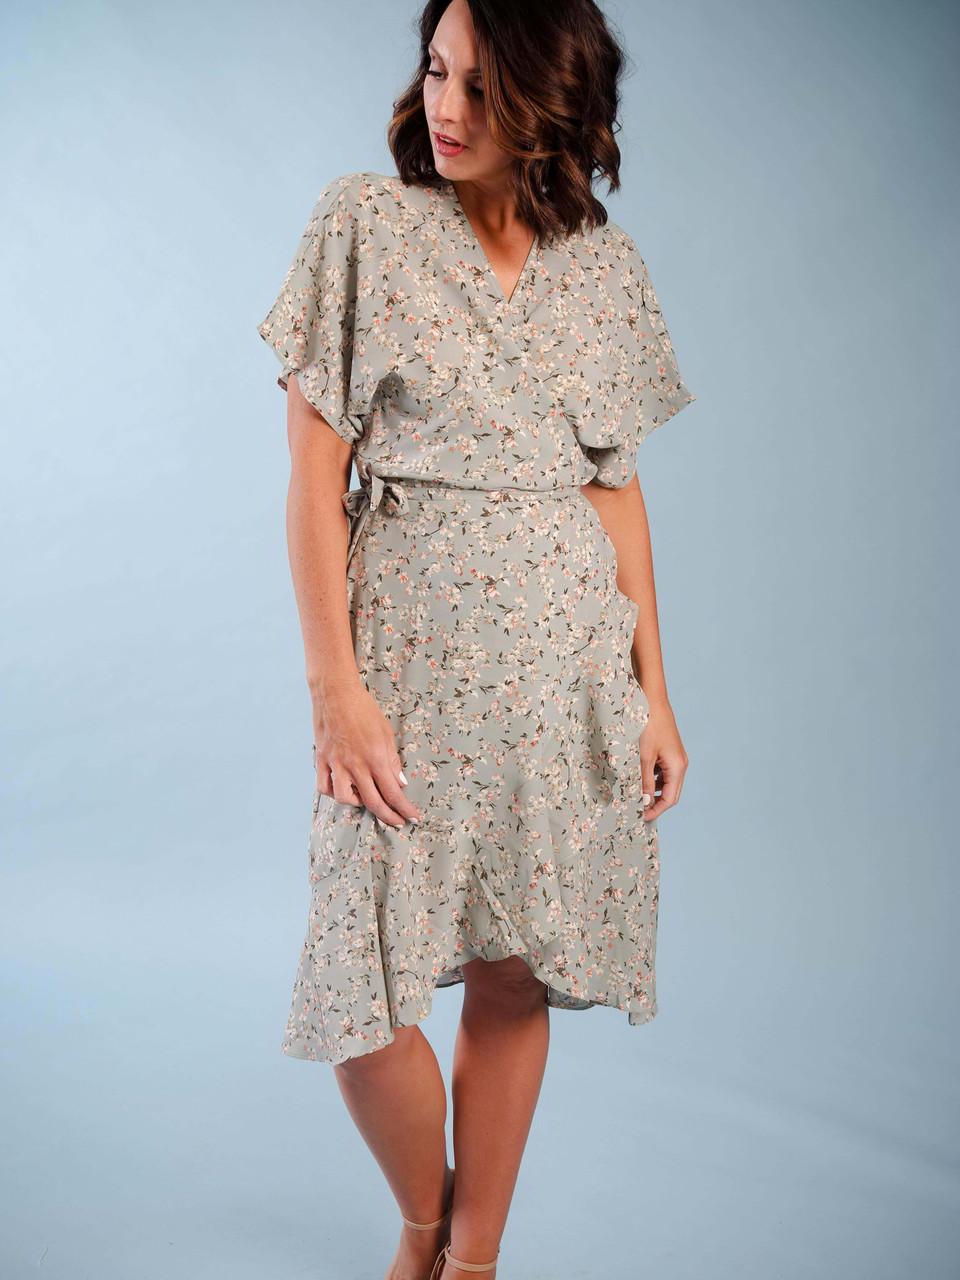 one size wrap dress high/low hem ruffle detail